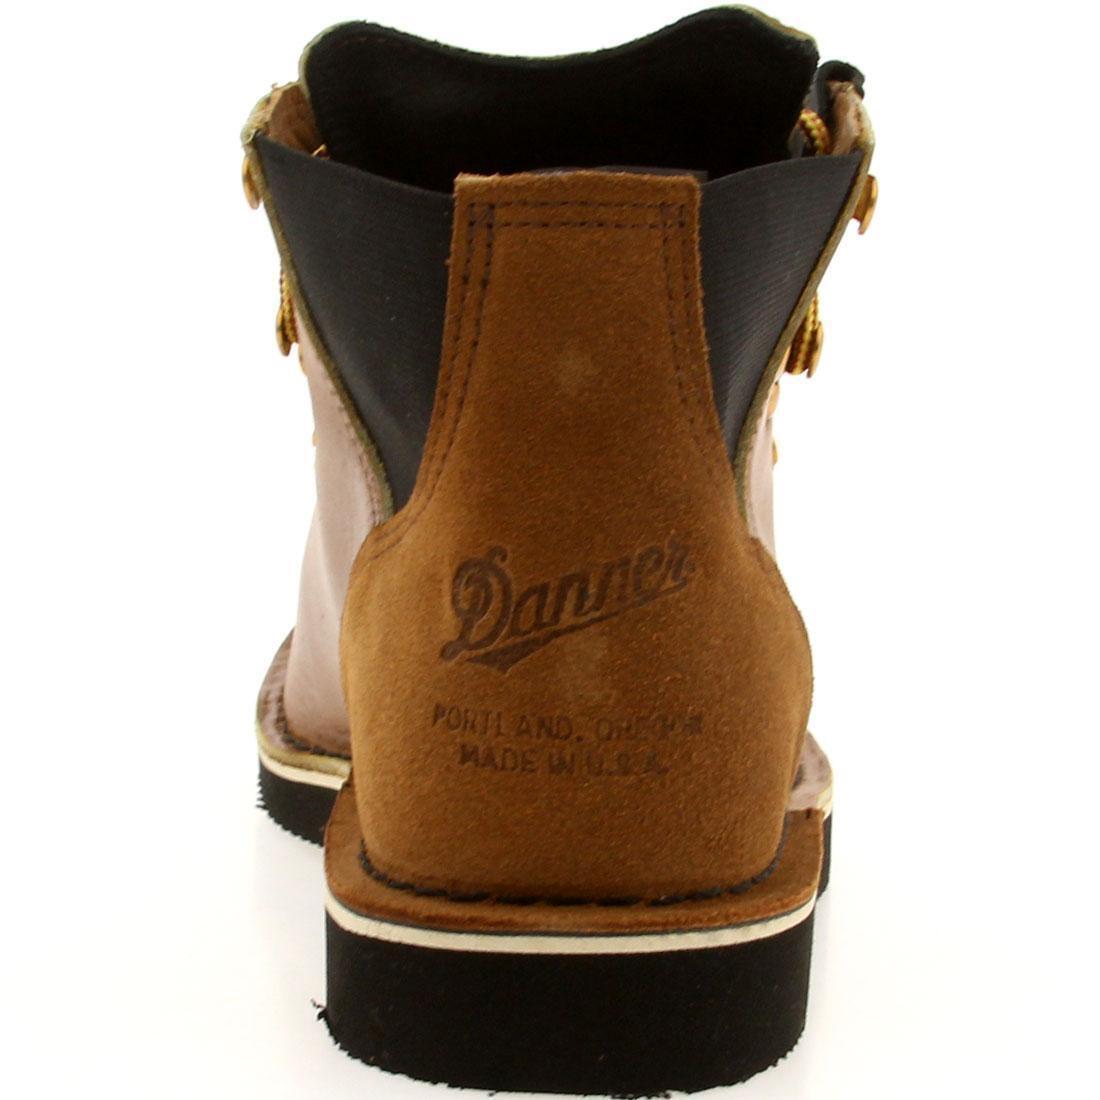 319.99  320 Danner Uomo Uomo Danner Vertigo 1845 brown 33112 5cadfb